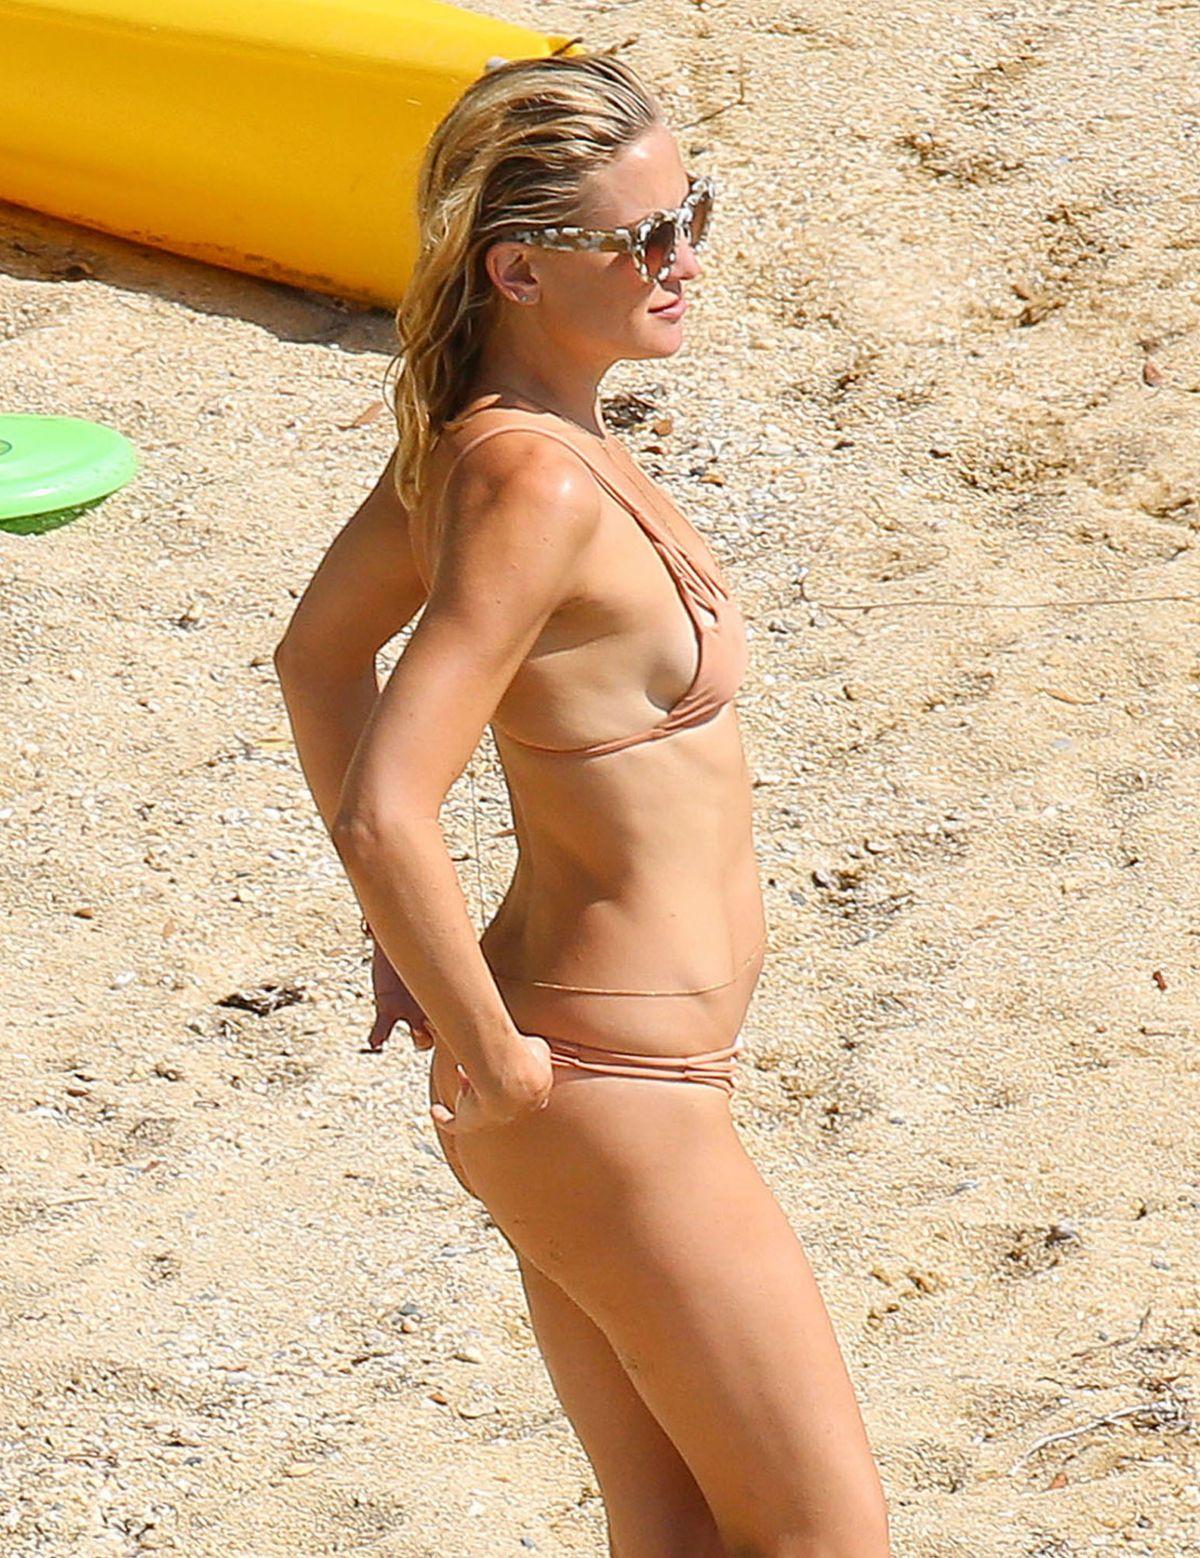 KATE HUDSON in Bikini on Vacation in Greece 06/16/2015